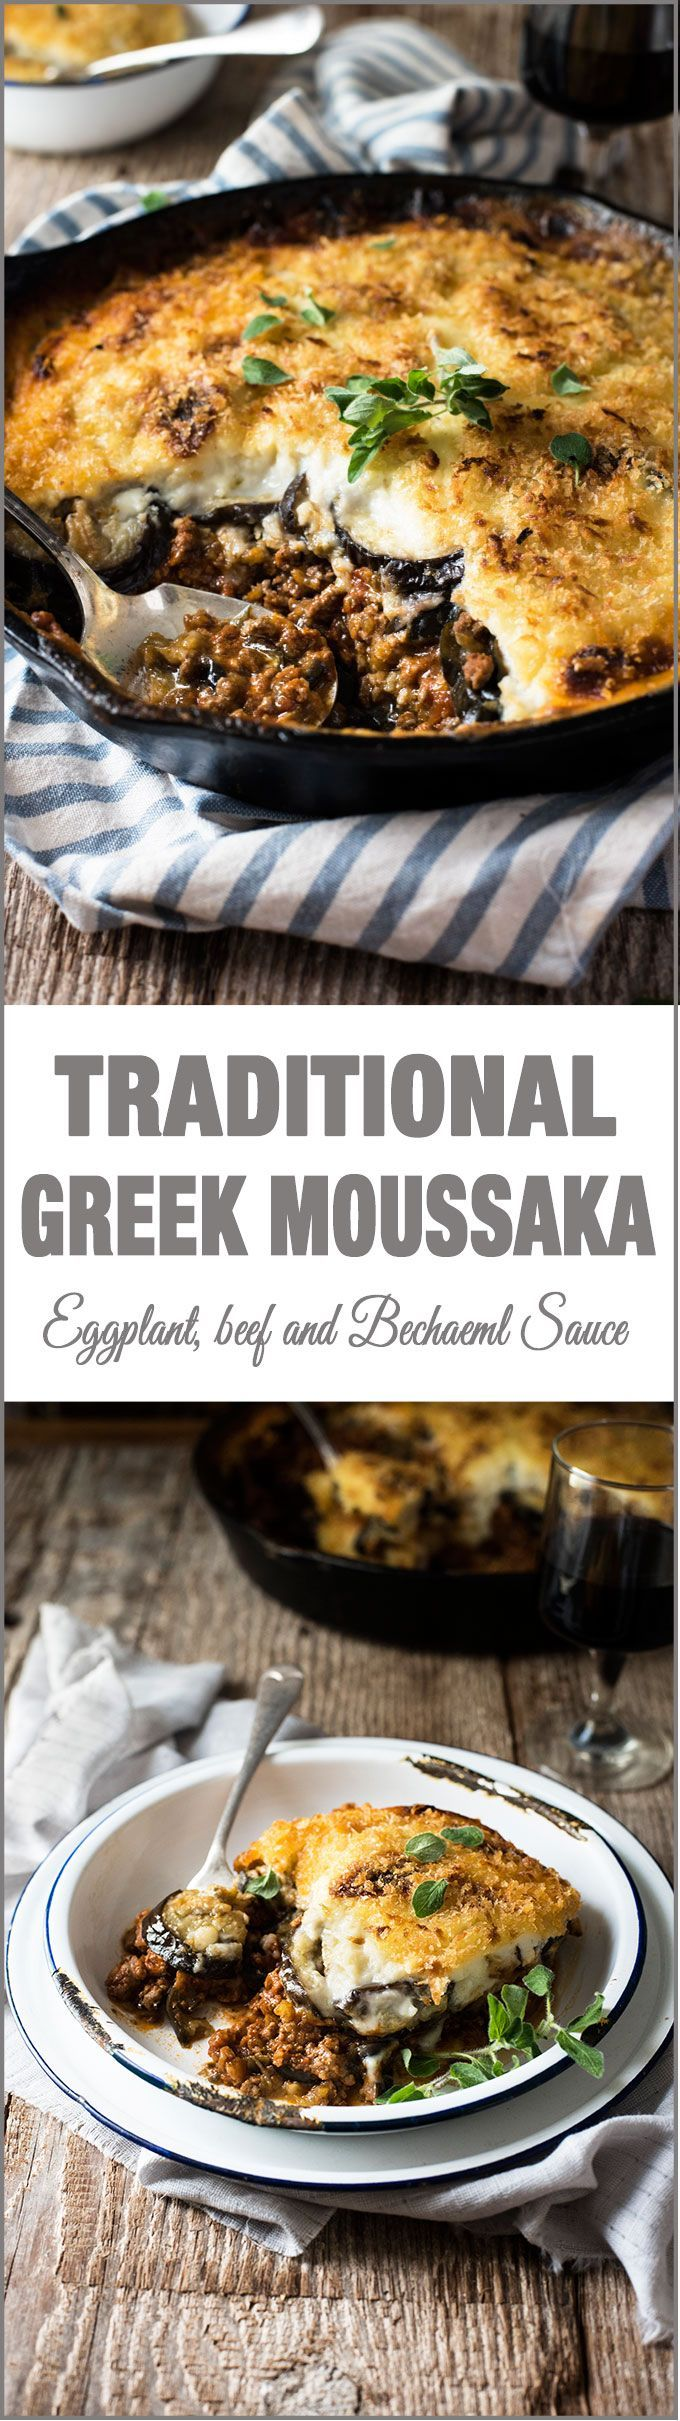 108 best greek and mediterranean food and recipes images on pinterest greek moussaka eggplant beef bake forumfinder Choice Image